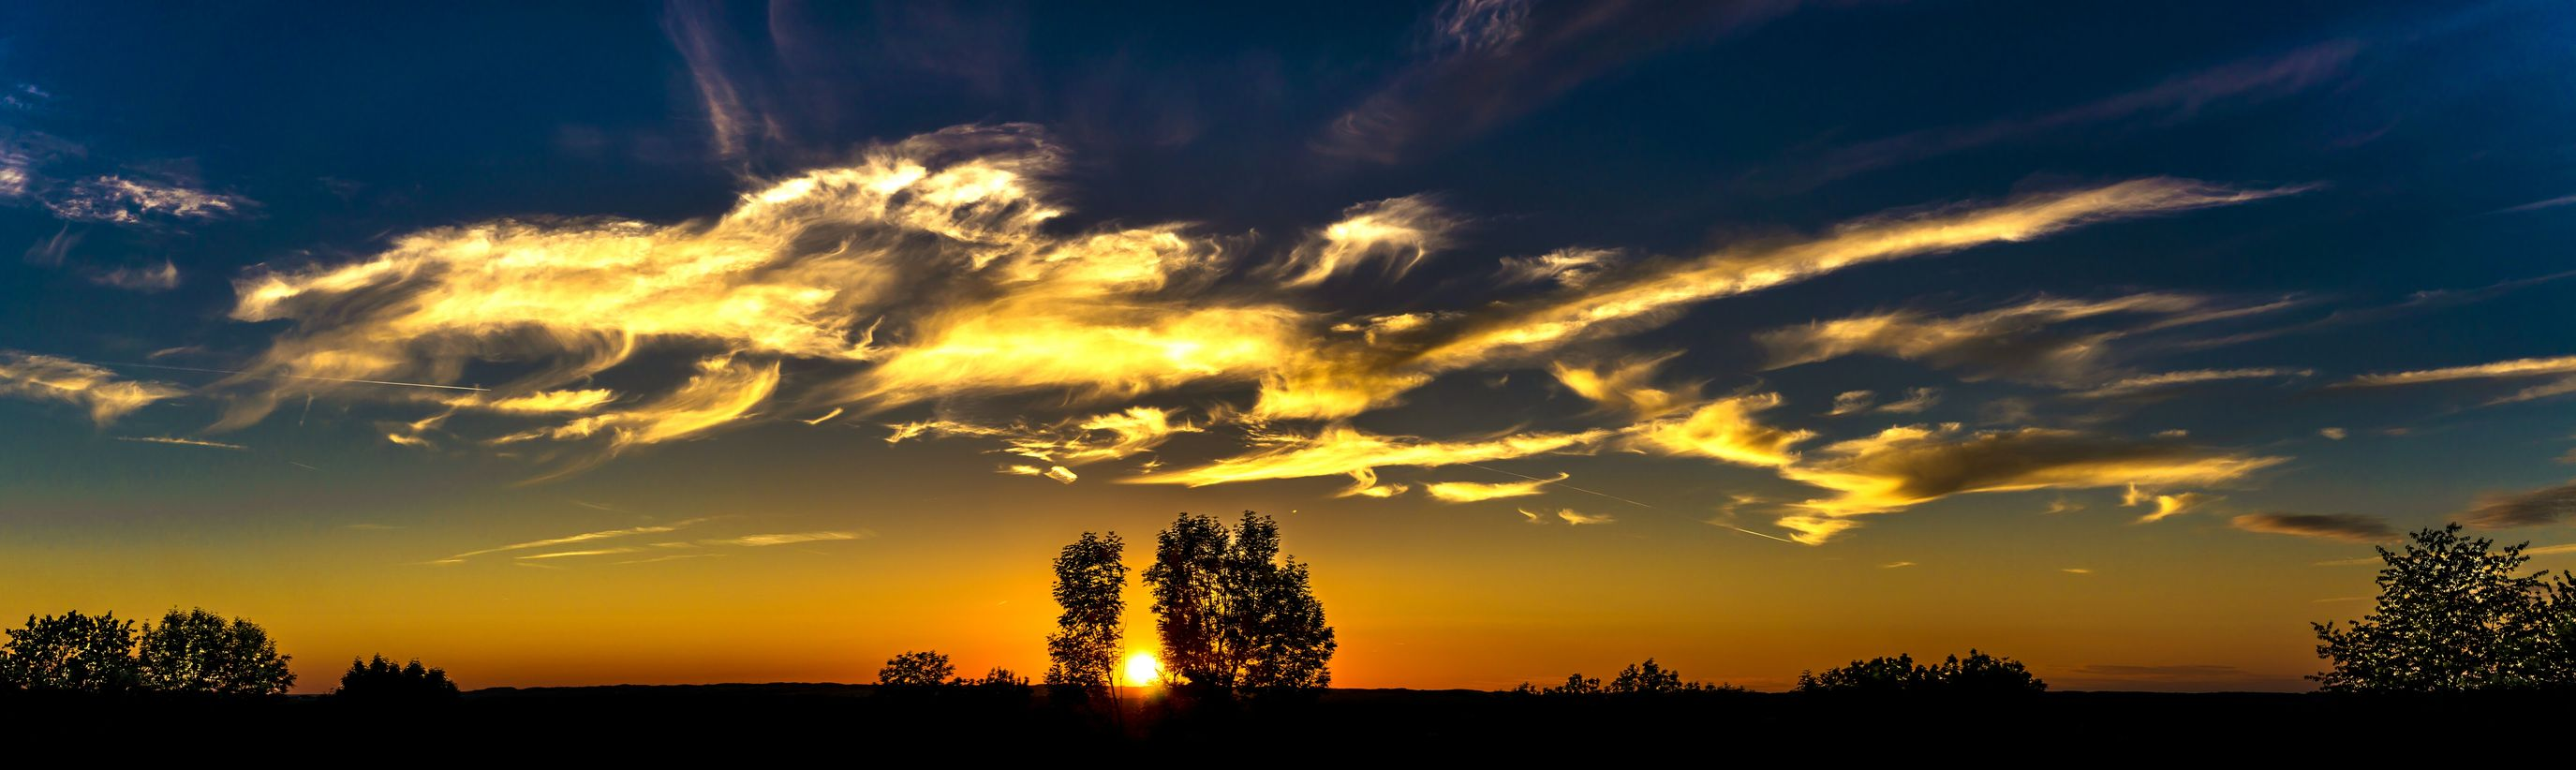 Panorama sunset Sunset Night Cloud - Sky Sky Tree Nature Outdoors Scenics Beauty In Nature Landscape Sun Sunrise Sky And Clouds Panorama Clouds Dusk Mood Moody Sky Evening Wild Screen Wallpaper Summer Skyscape Landscape_photography Landscapes